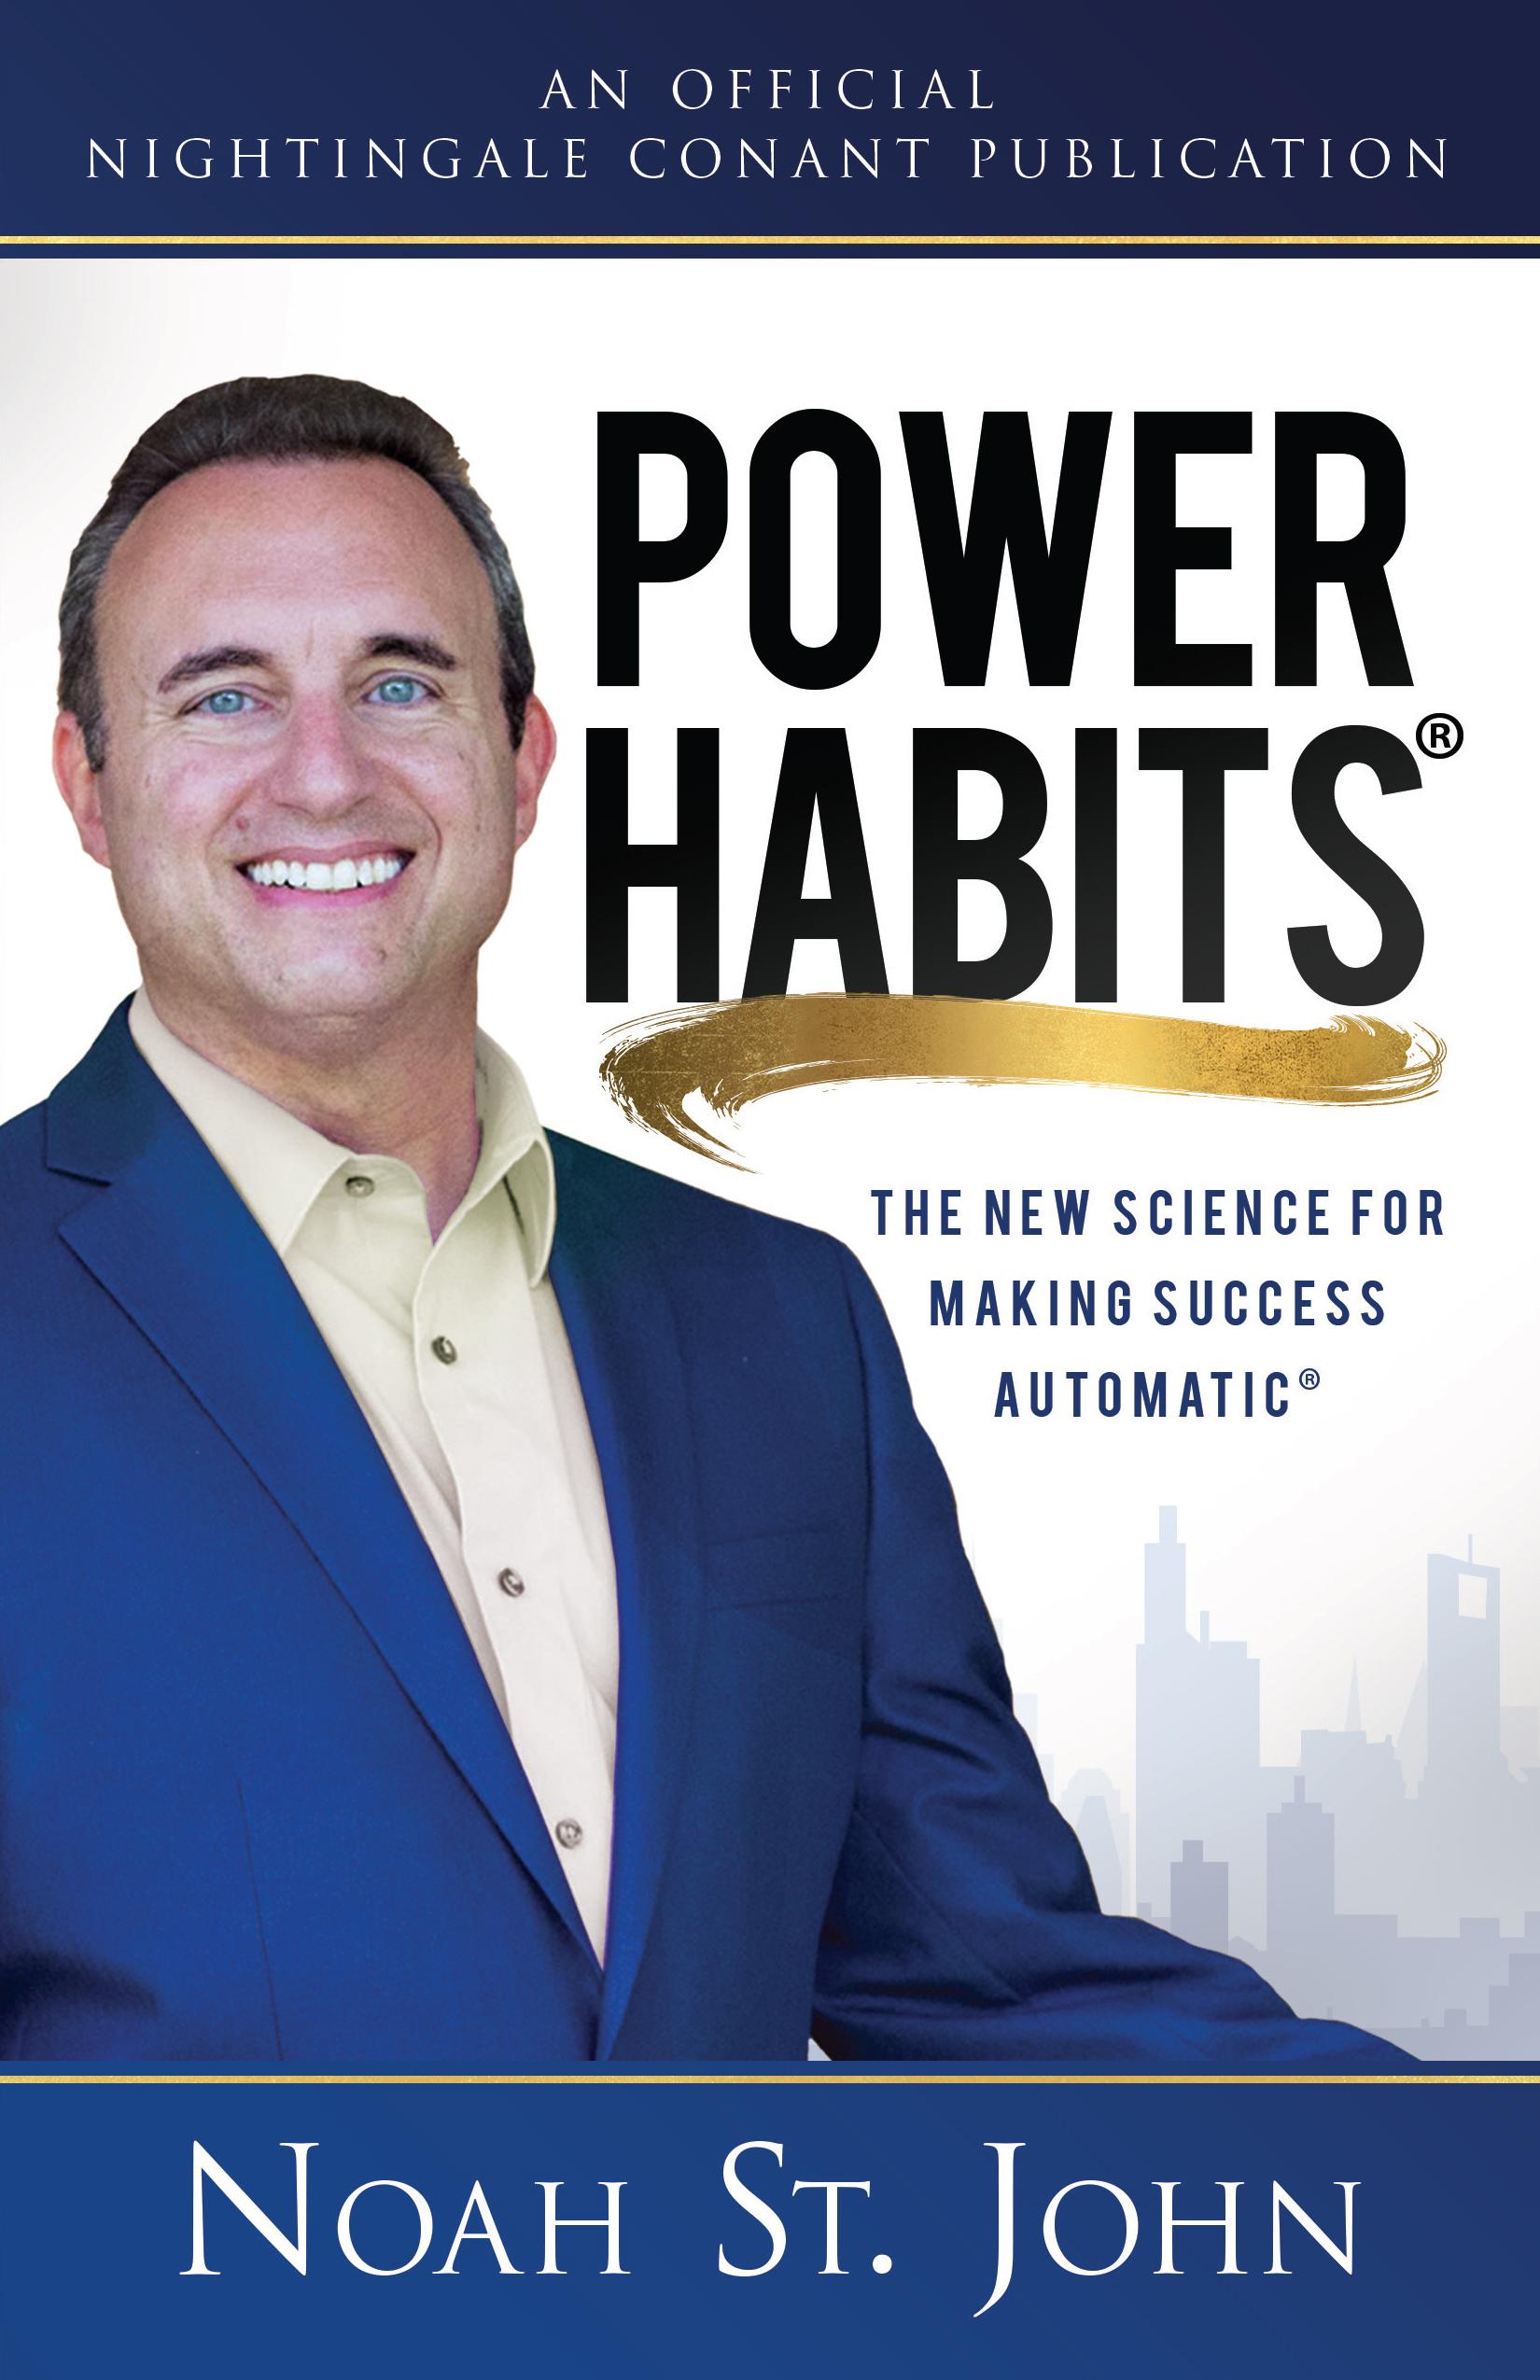 Power_Habits.jpg